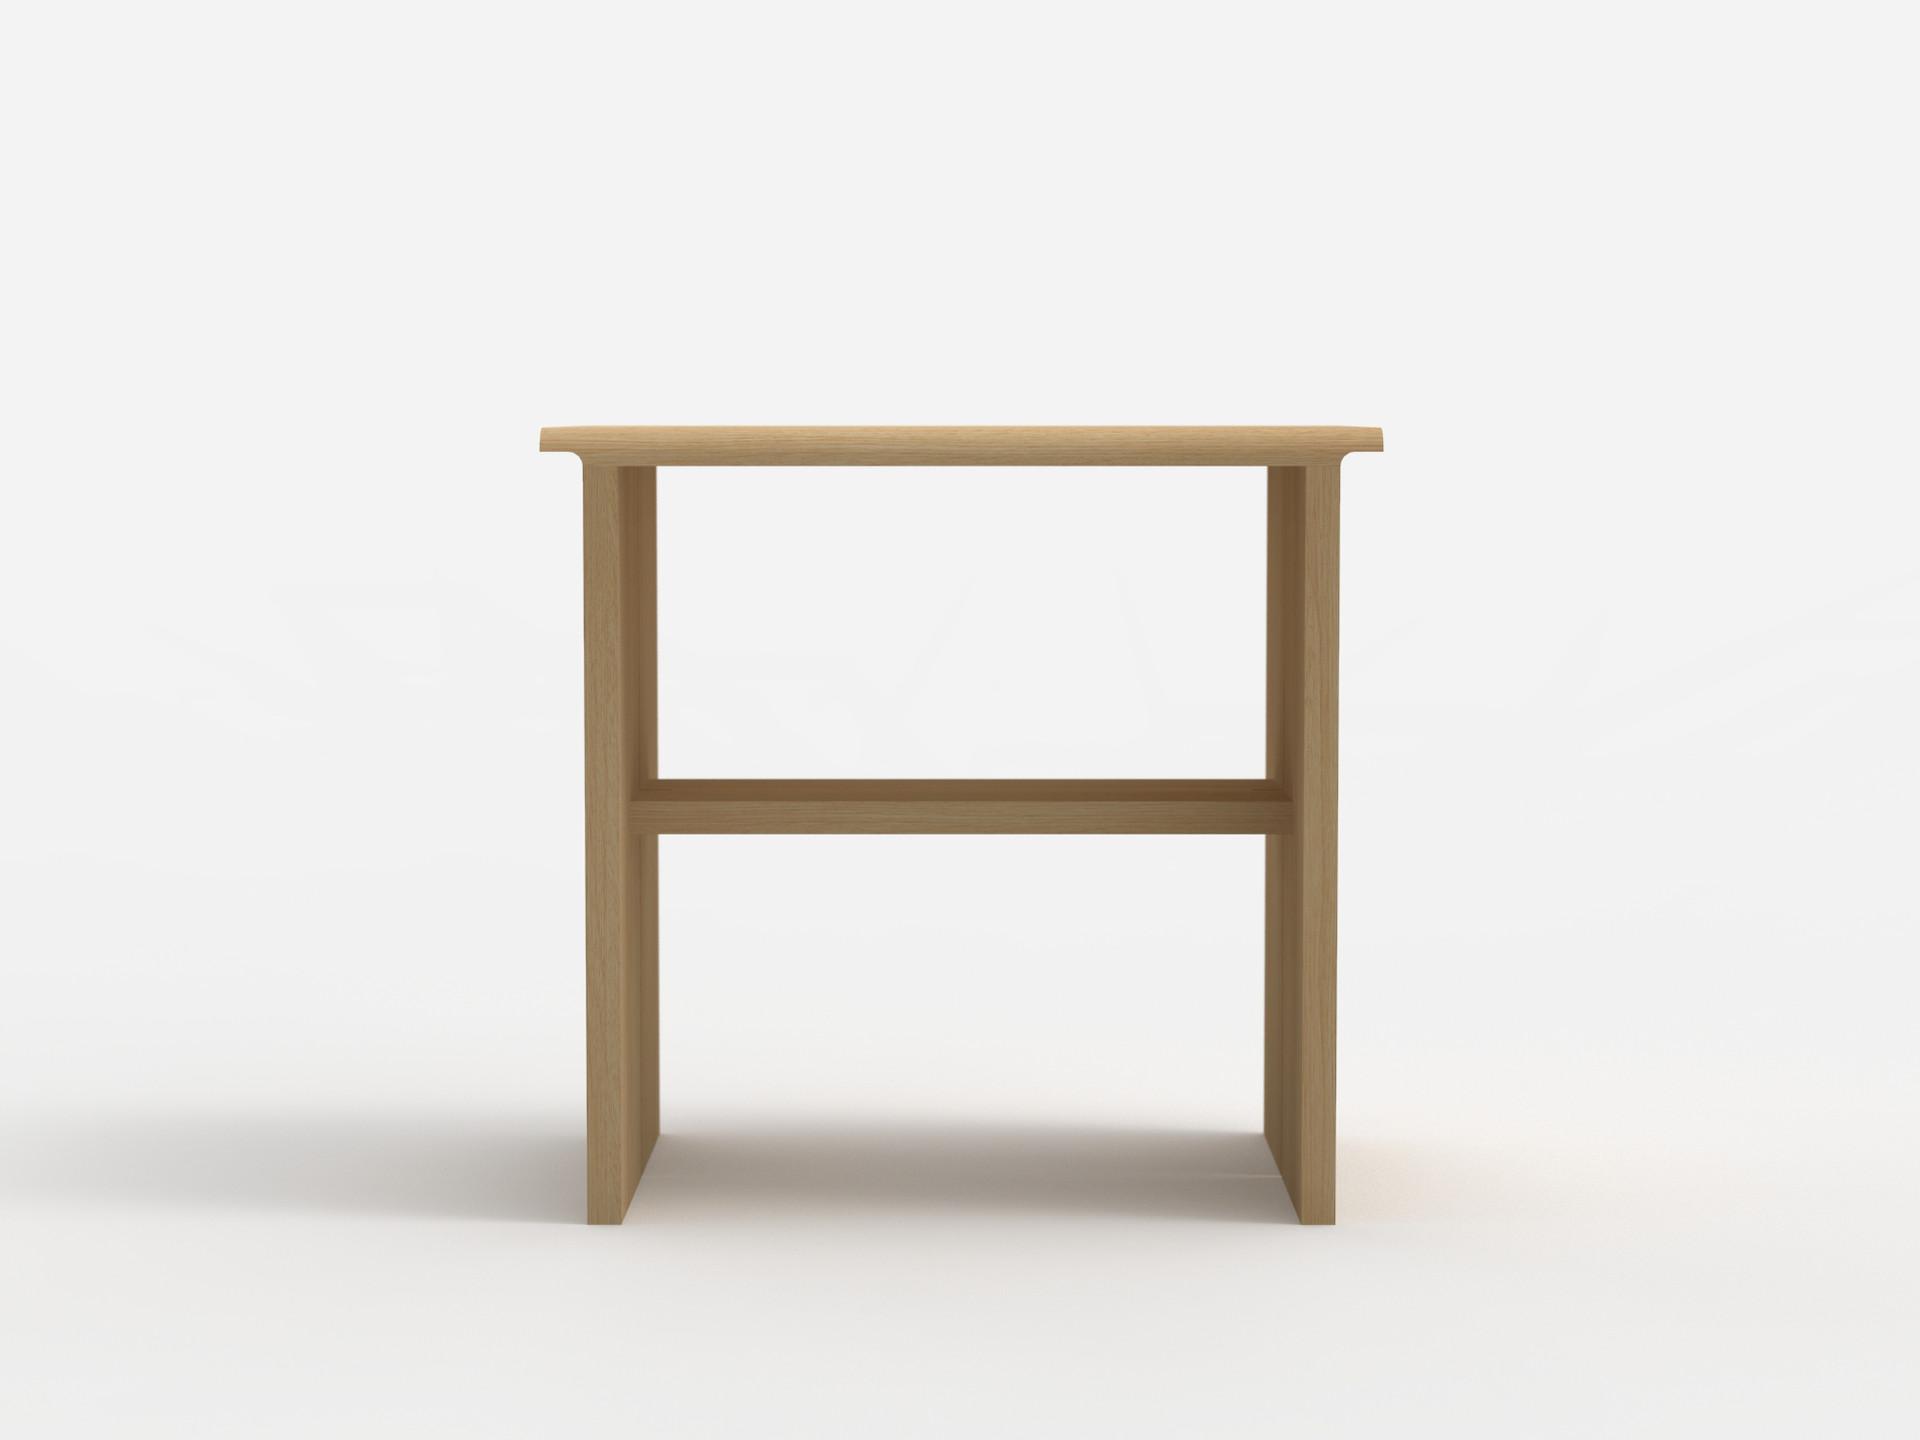 200516_stool_1.jpg